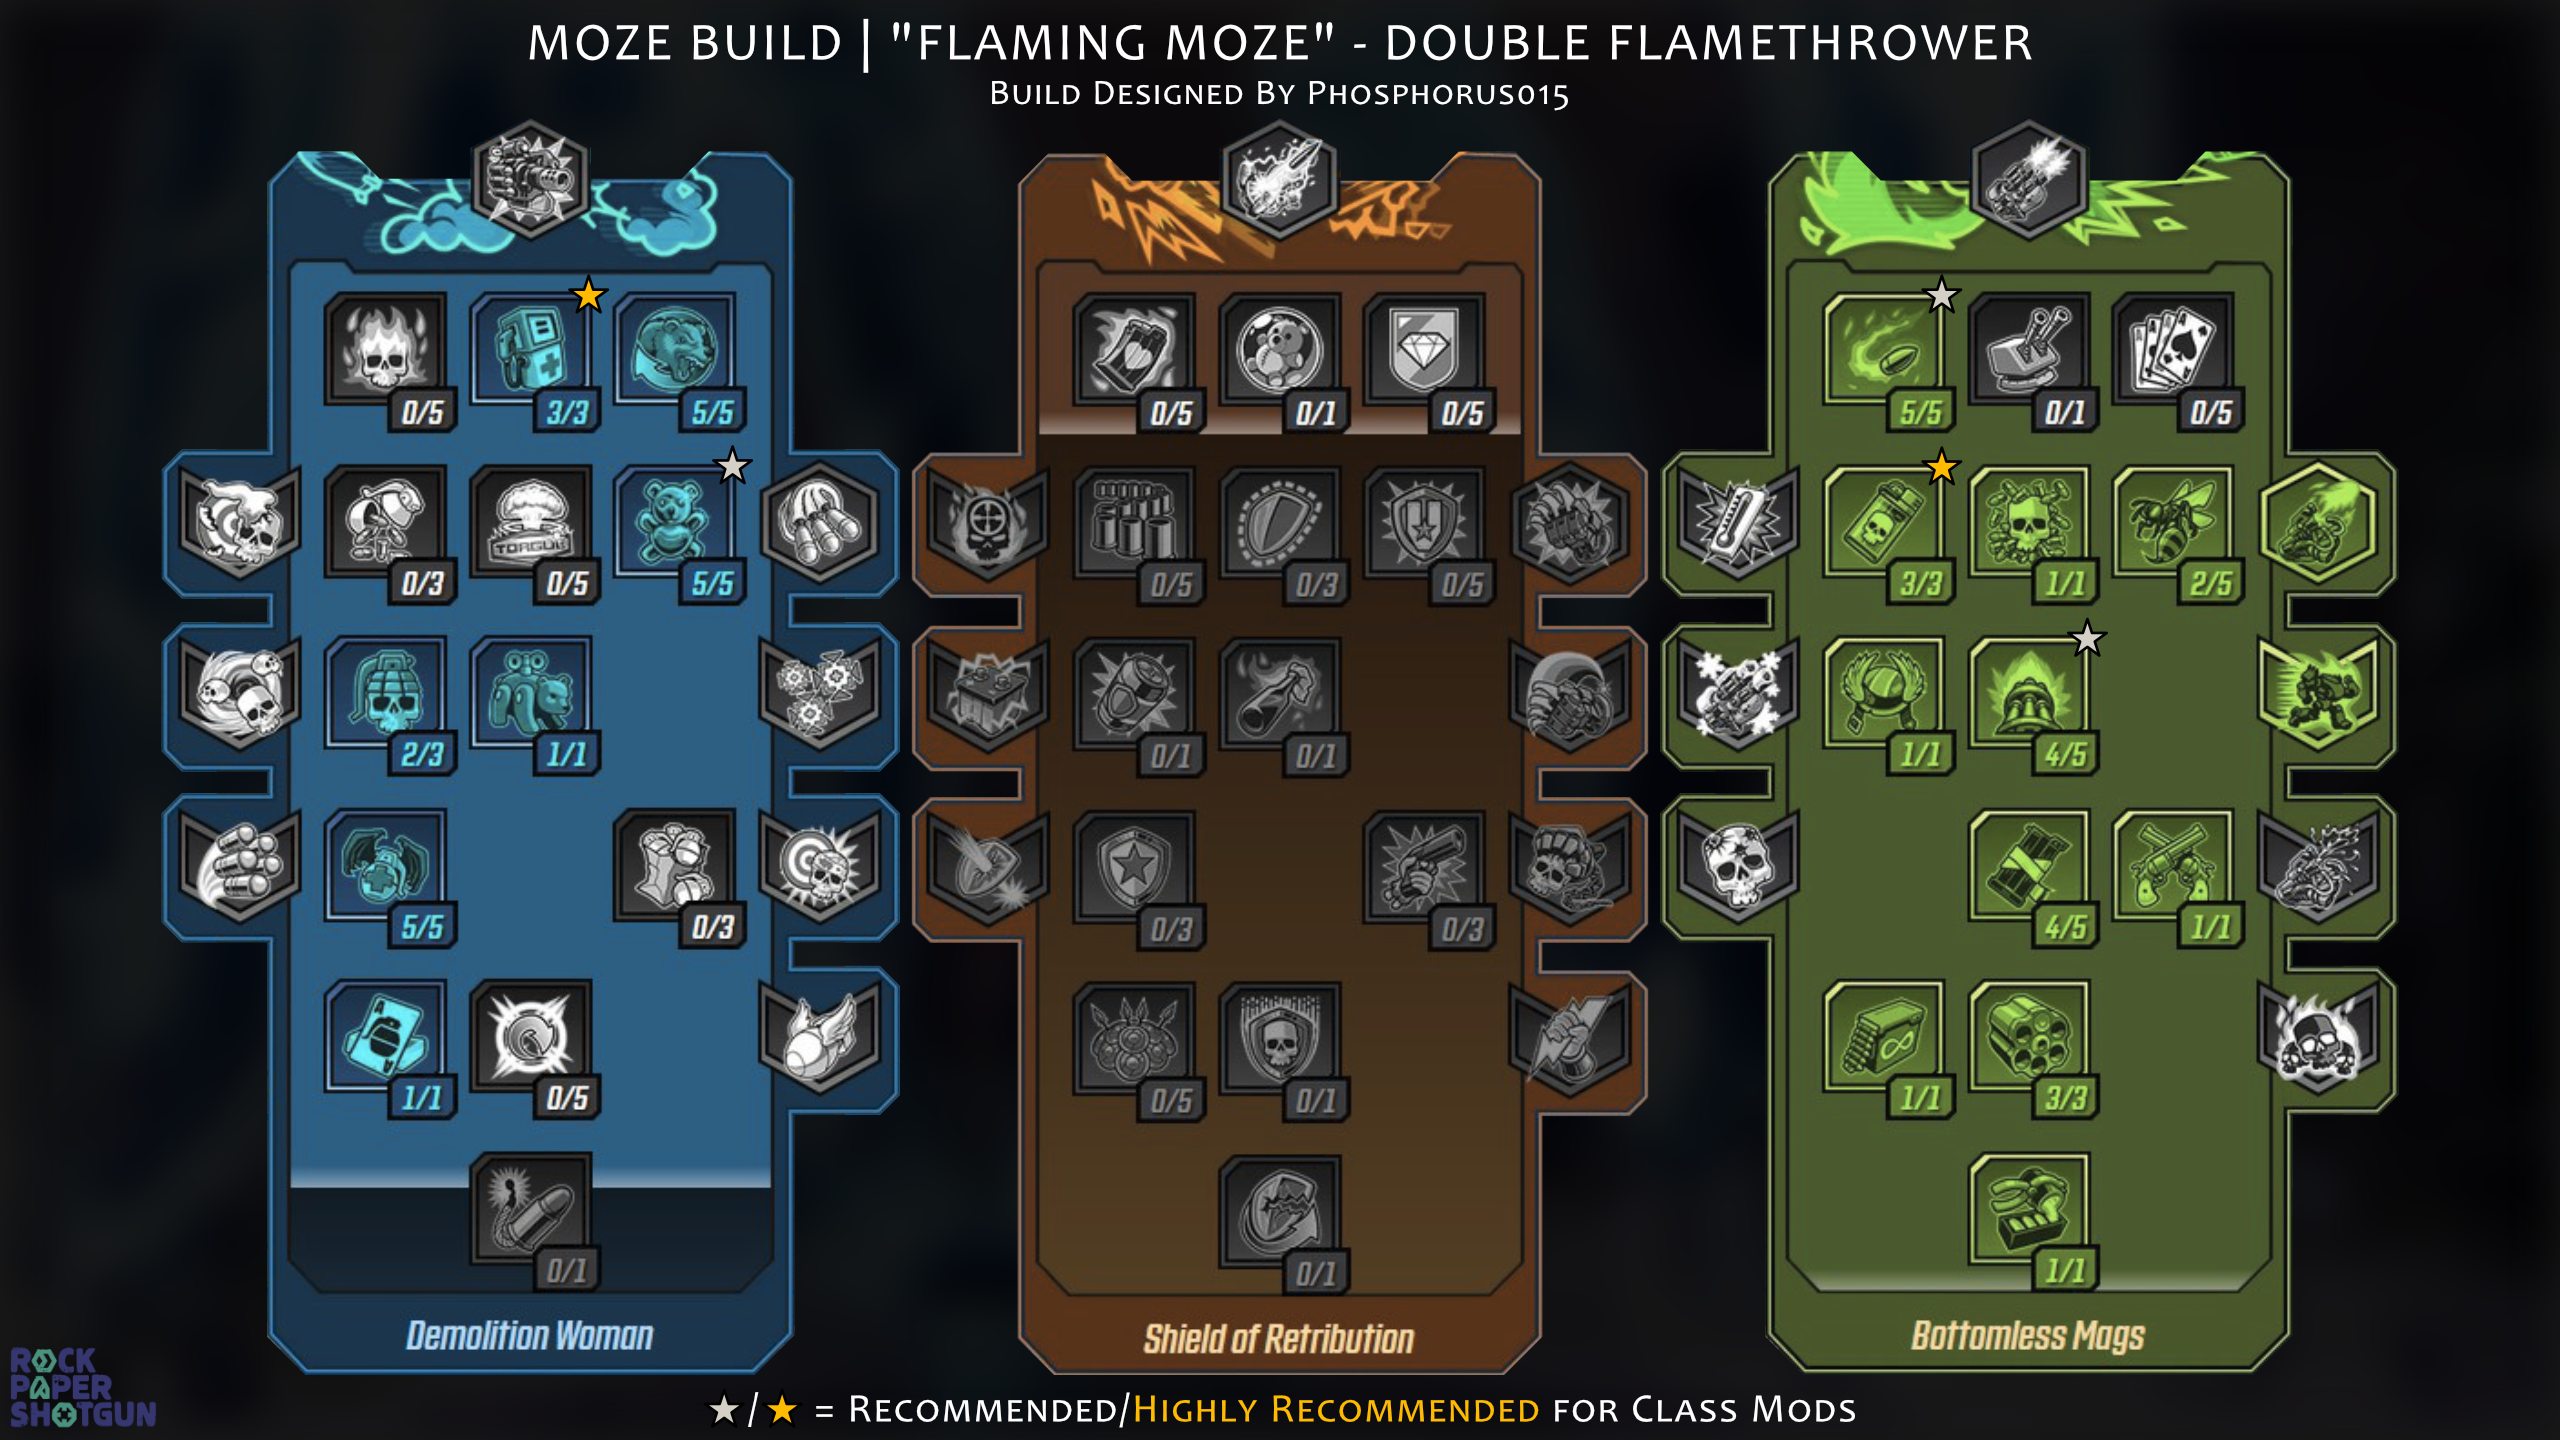 Borderlands 3 Moze build - Double Flamethrower